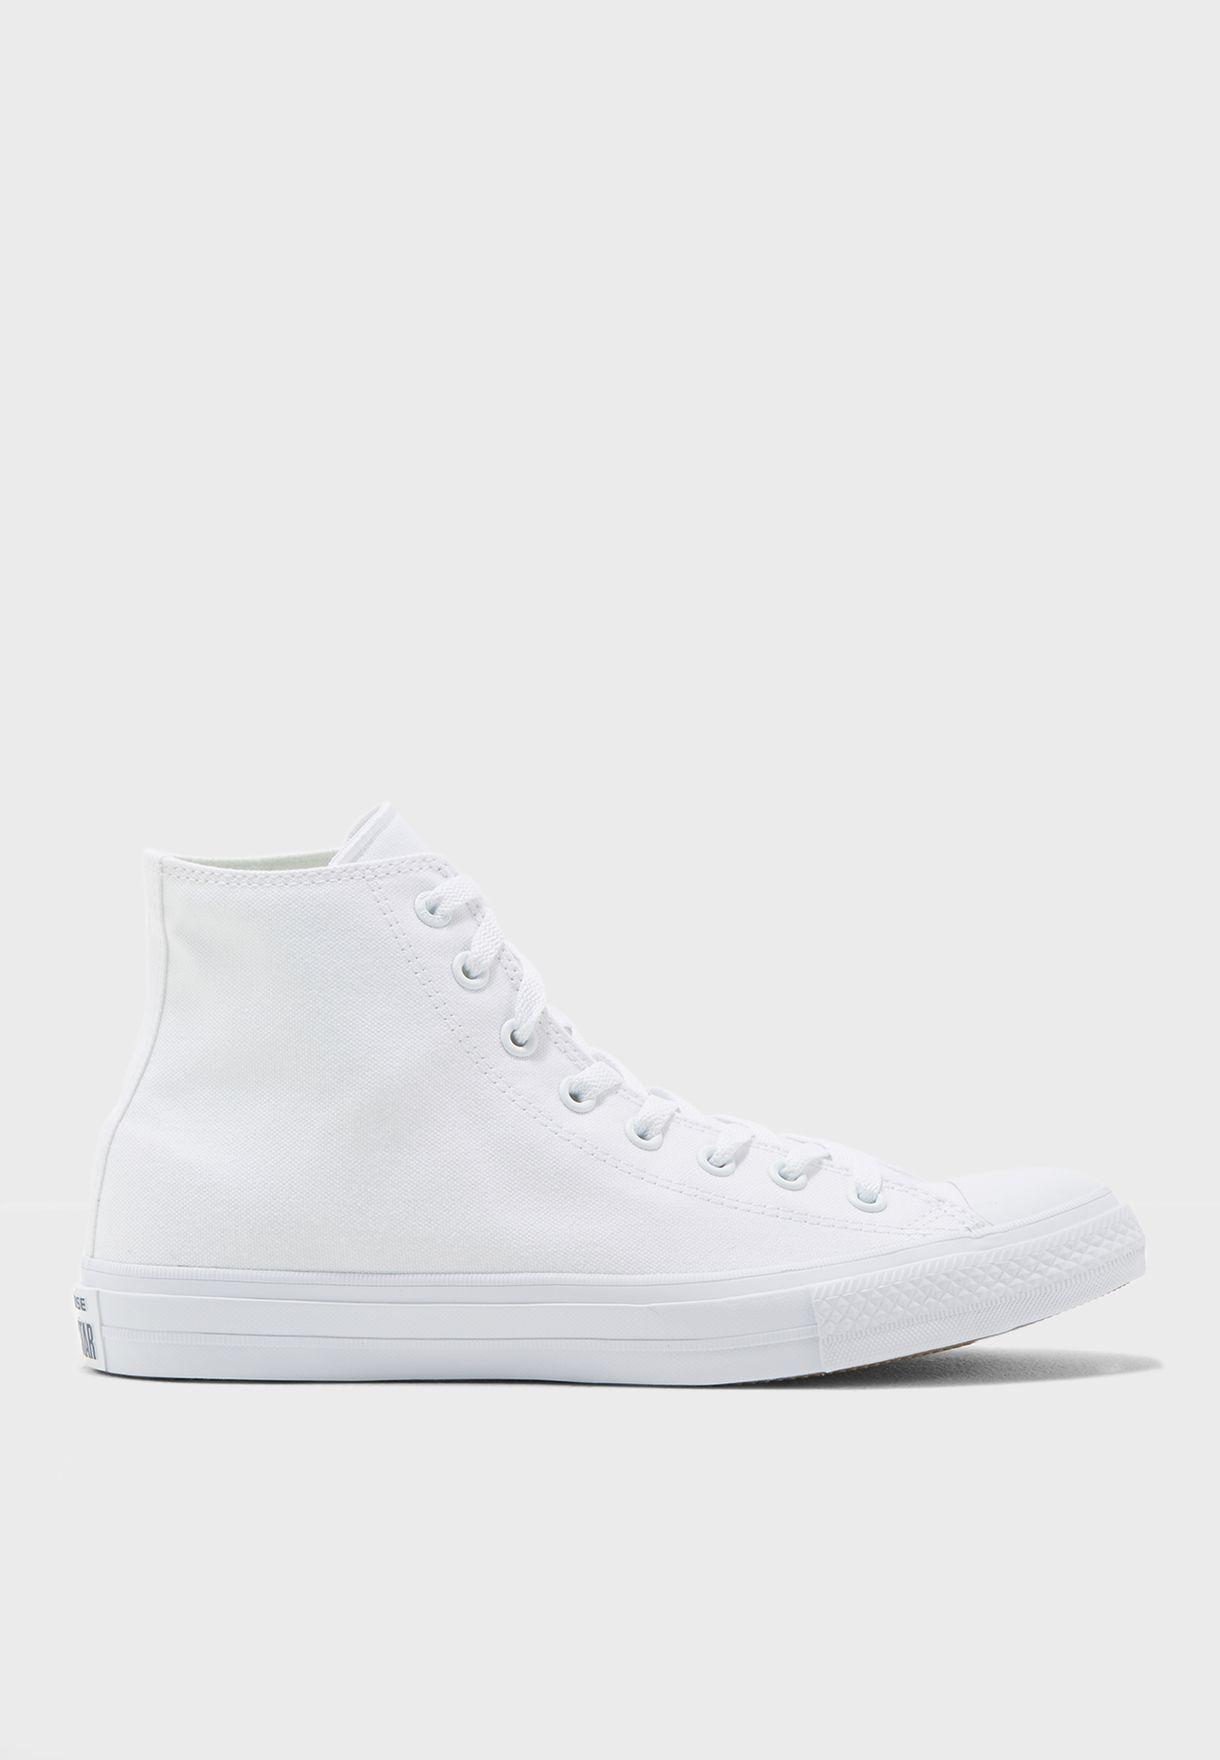 1909589469fec1 Shop Converse white Chuck Taylor All Star II Evergreen 150148C-100 ...